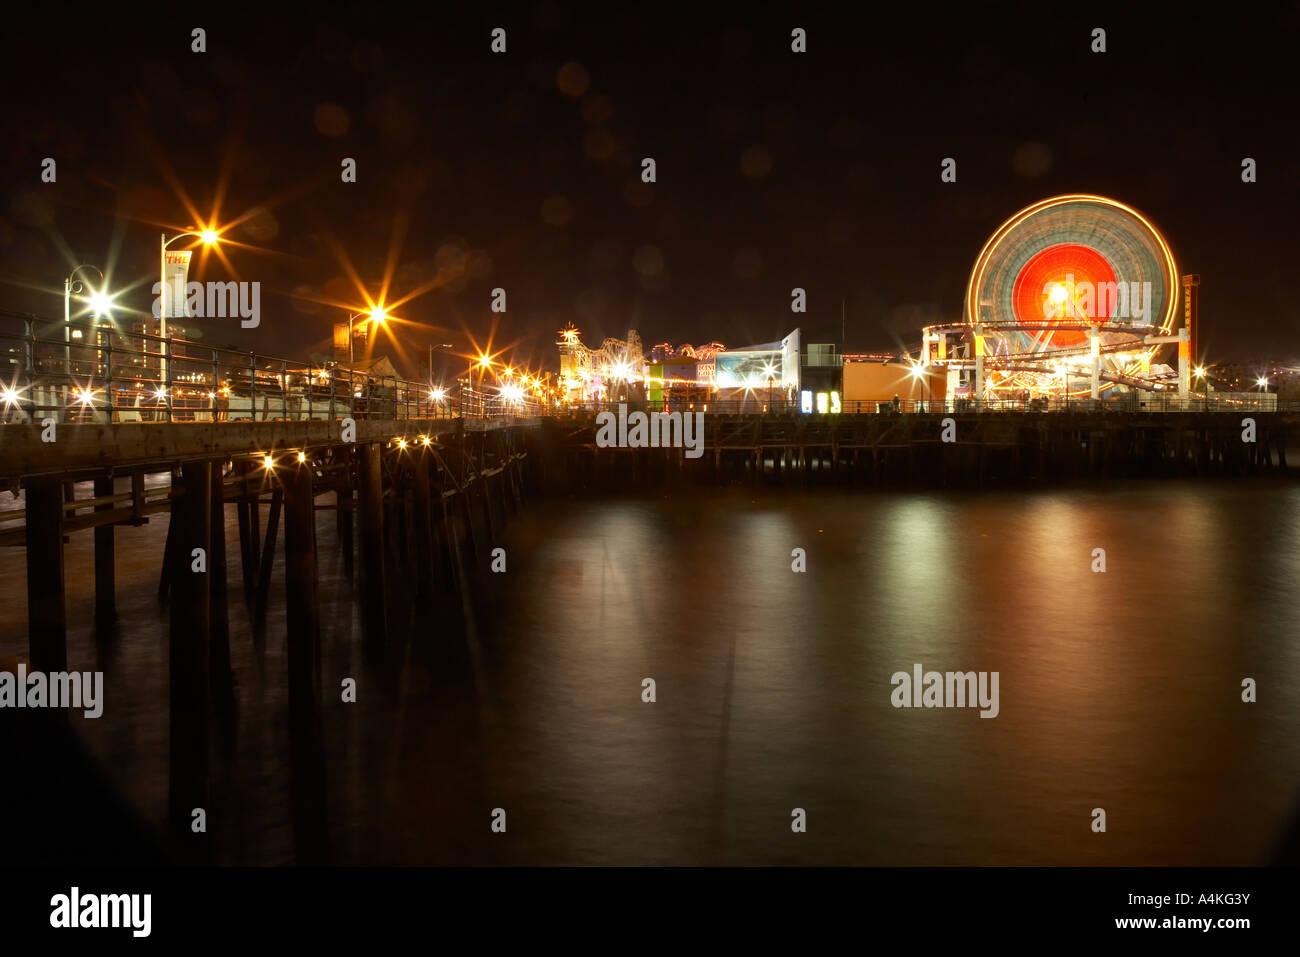 Une longue exposition de la Grande Roue de la jetée de Santa Monica, Los Angeles, Californie, USA. Photo Stock